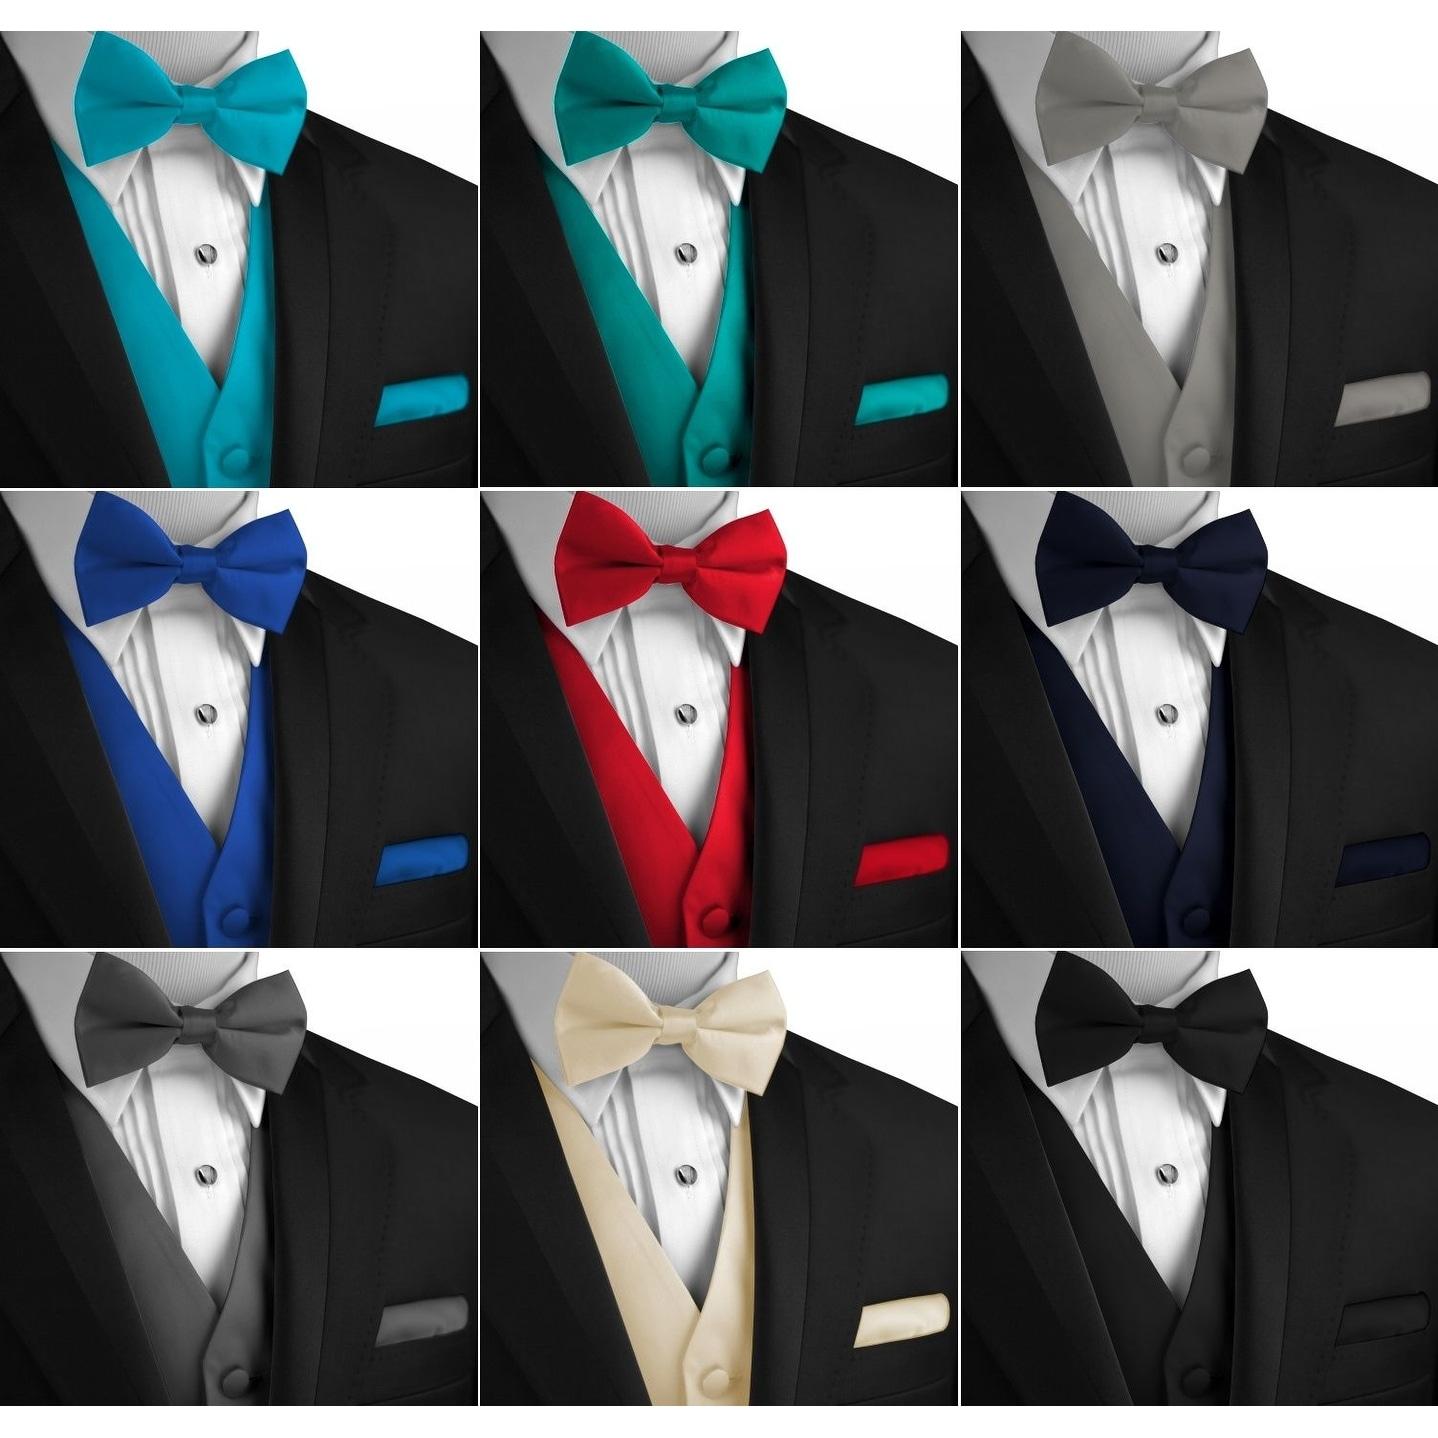 Dress Prom Bow-Tie set Men/'s Solid Satin Tuxedo Vest Cruise Wedding Formal